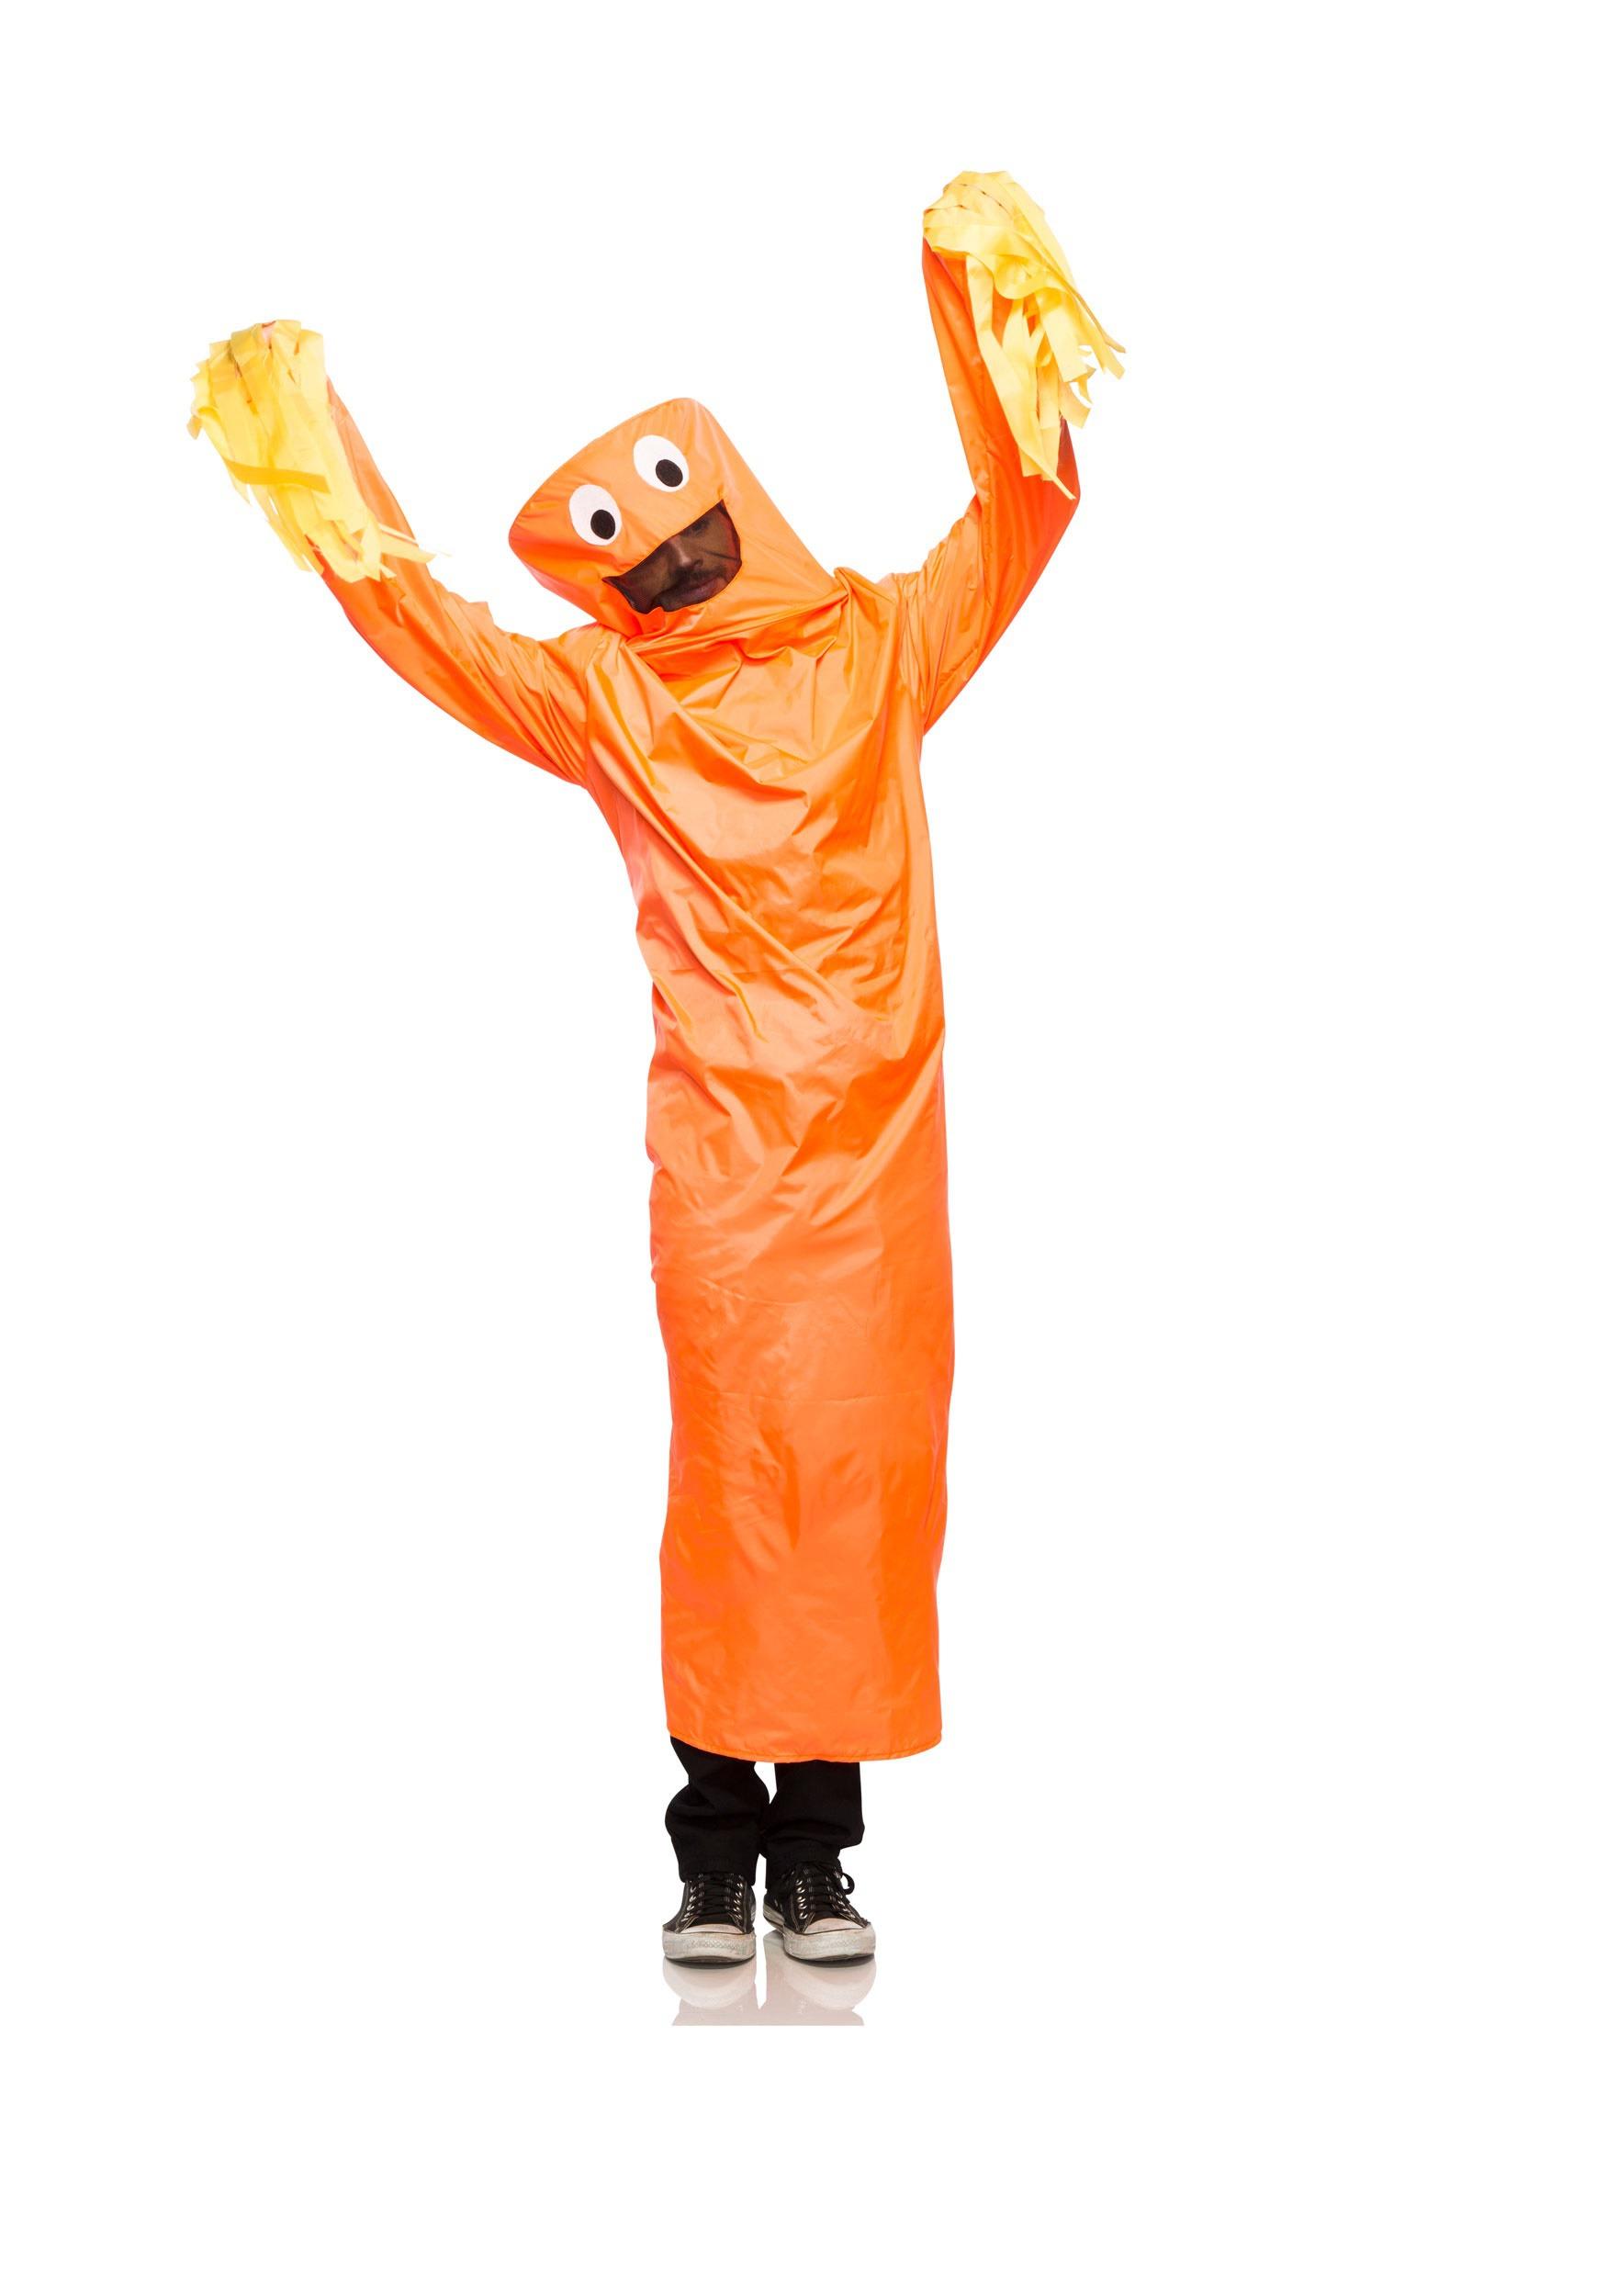 wacky waving arm man costume for adults